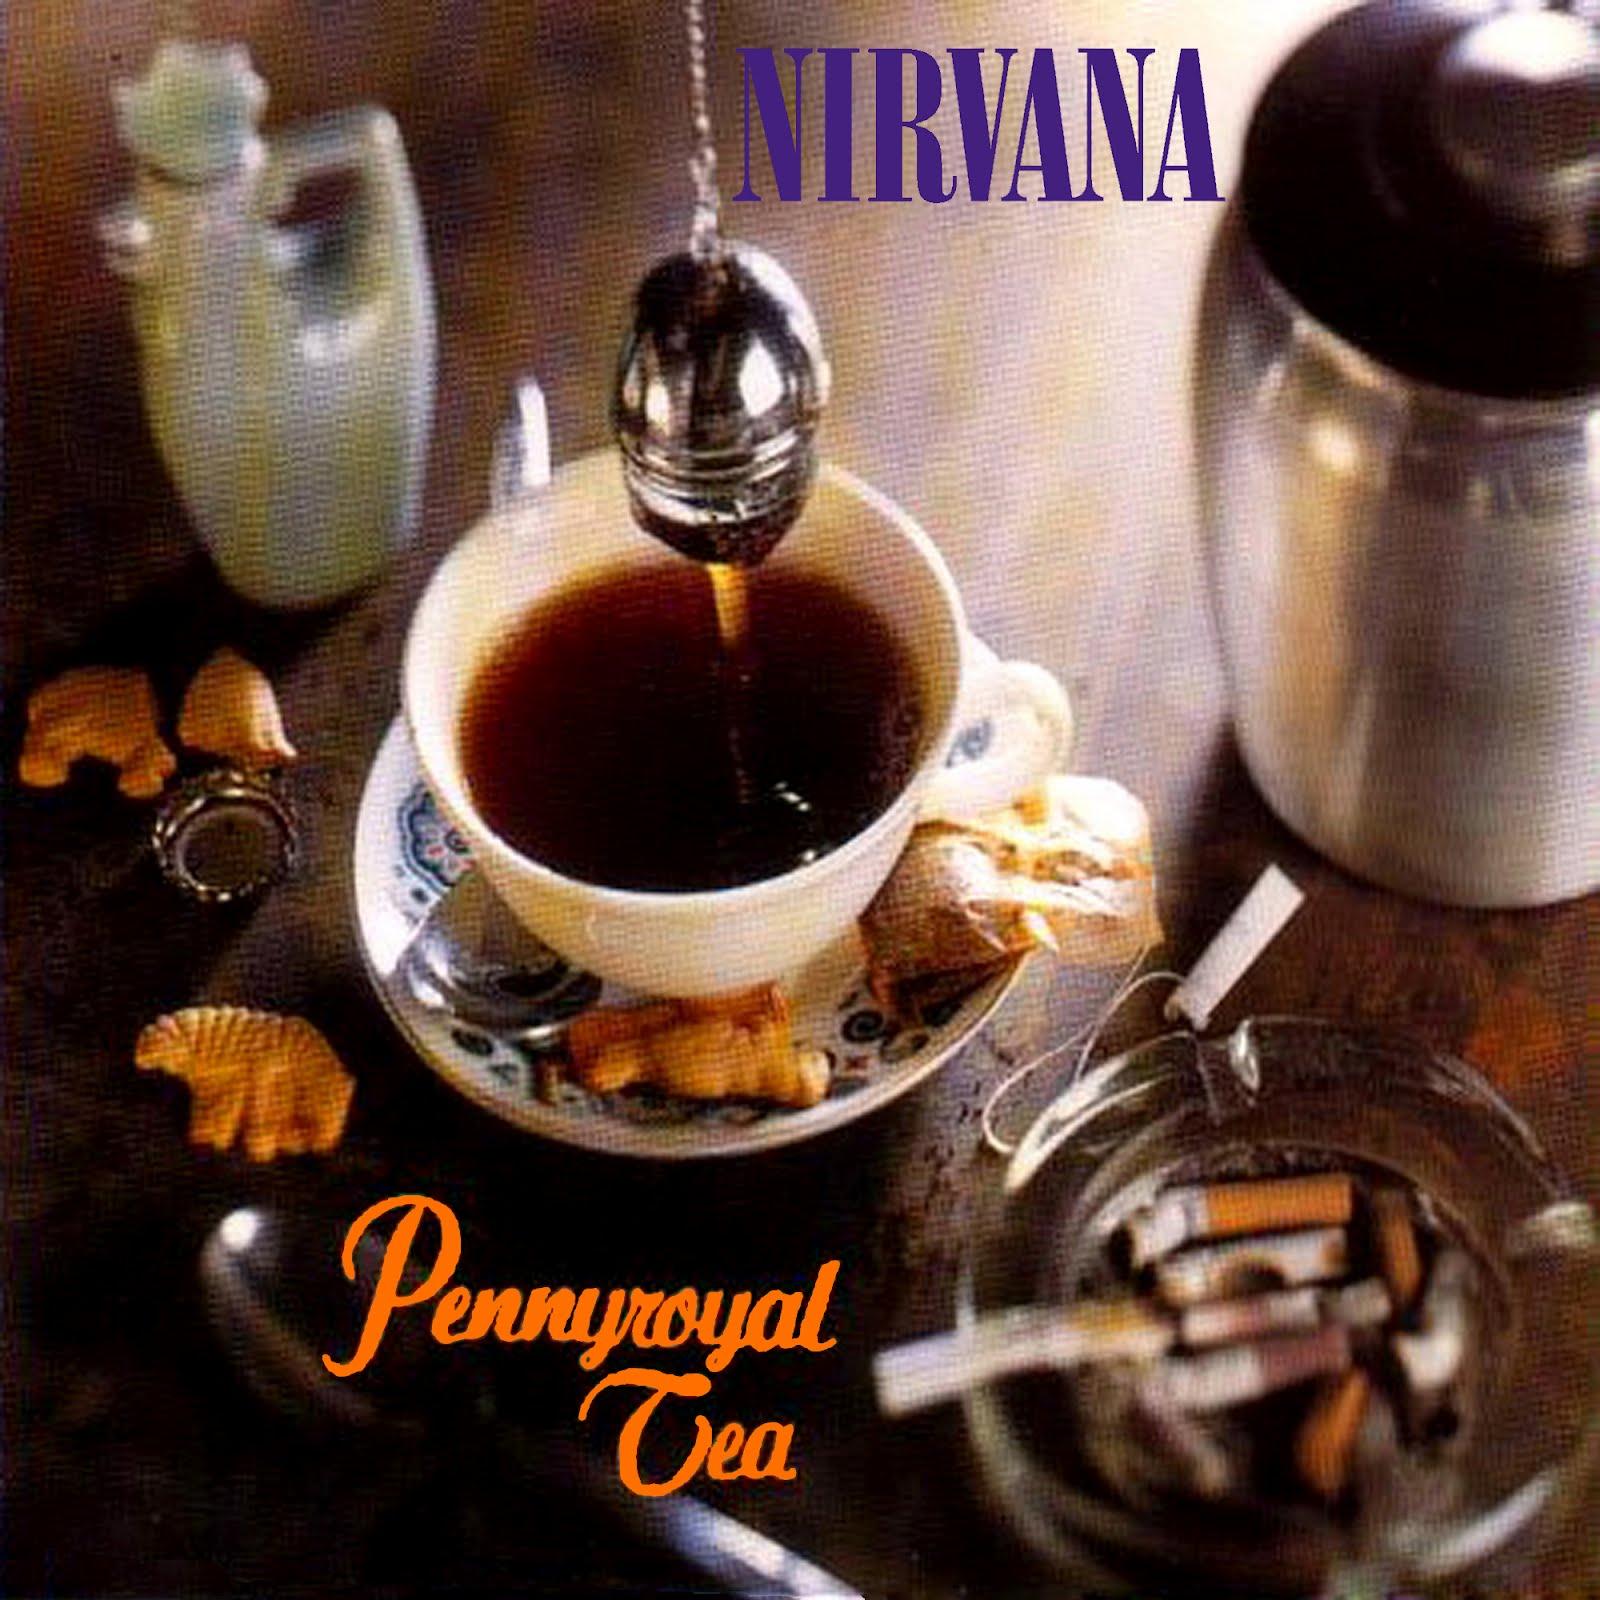 Listen To The Russian Kurt Cobain Sound Alike Cover